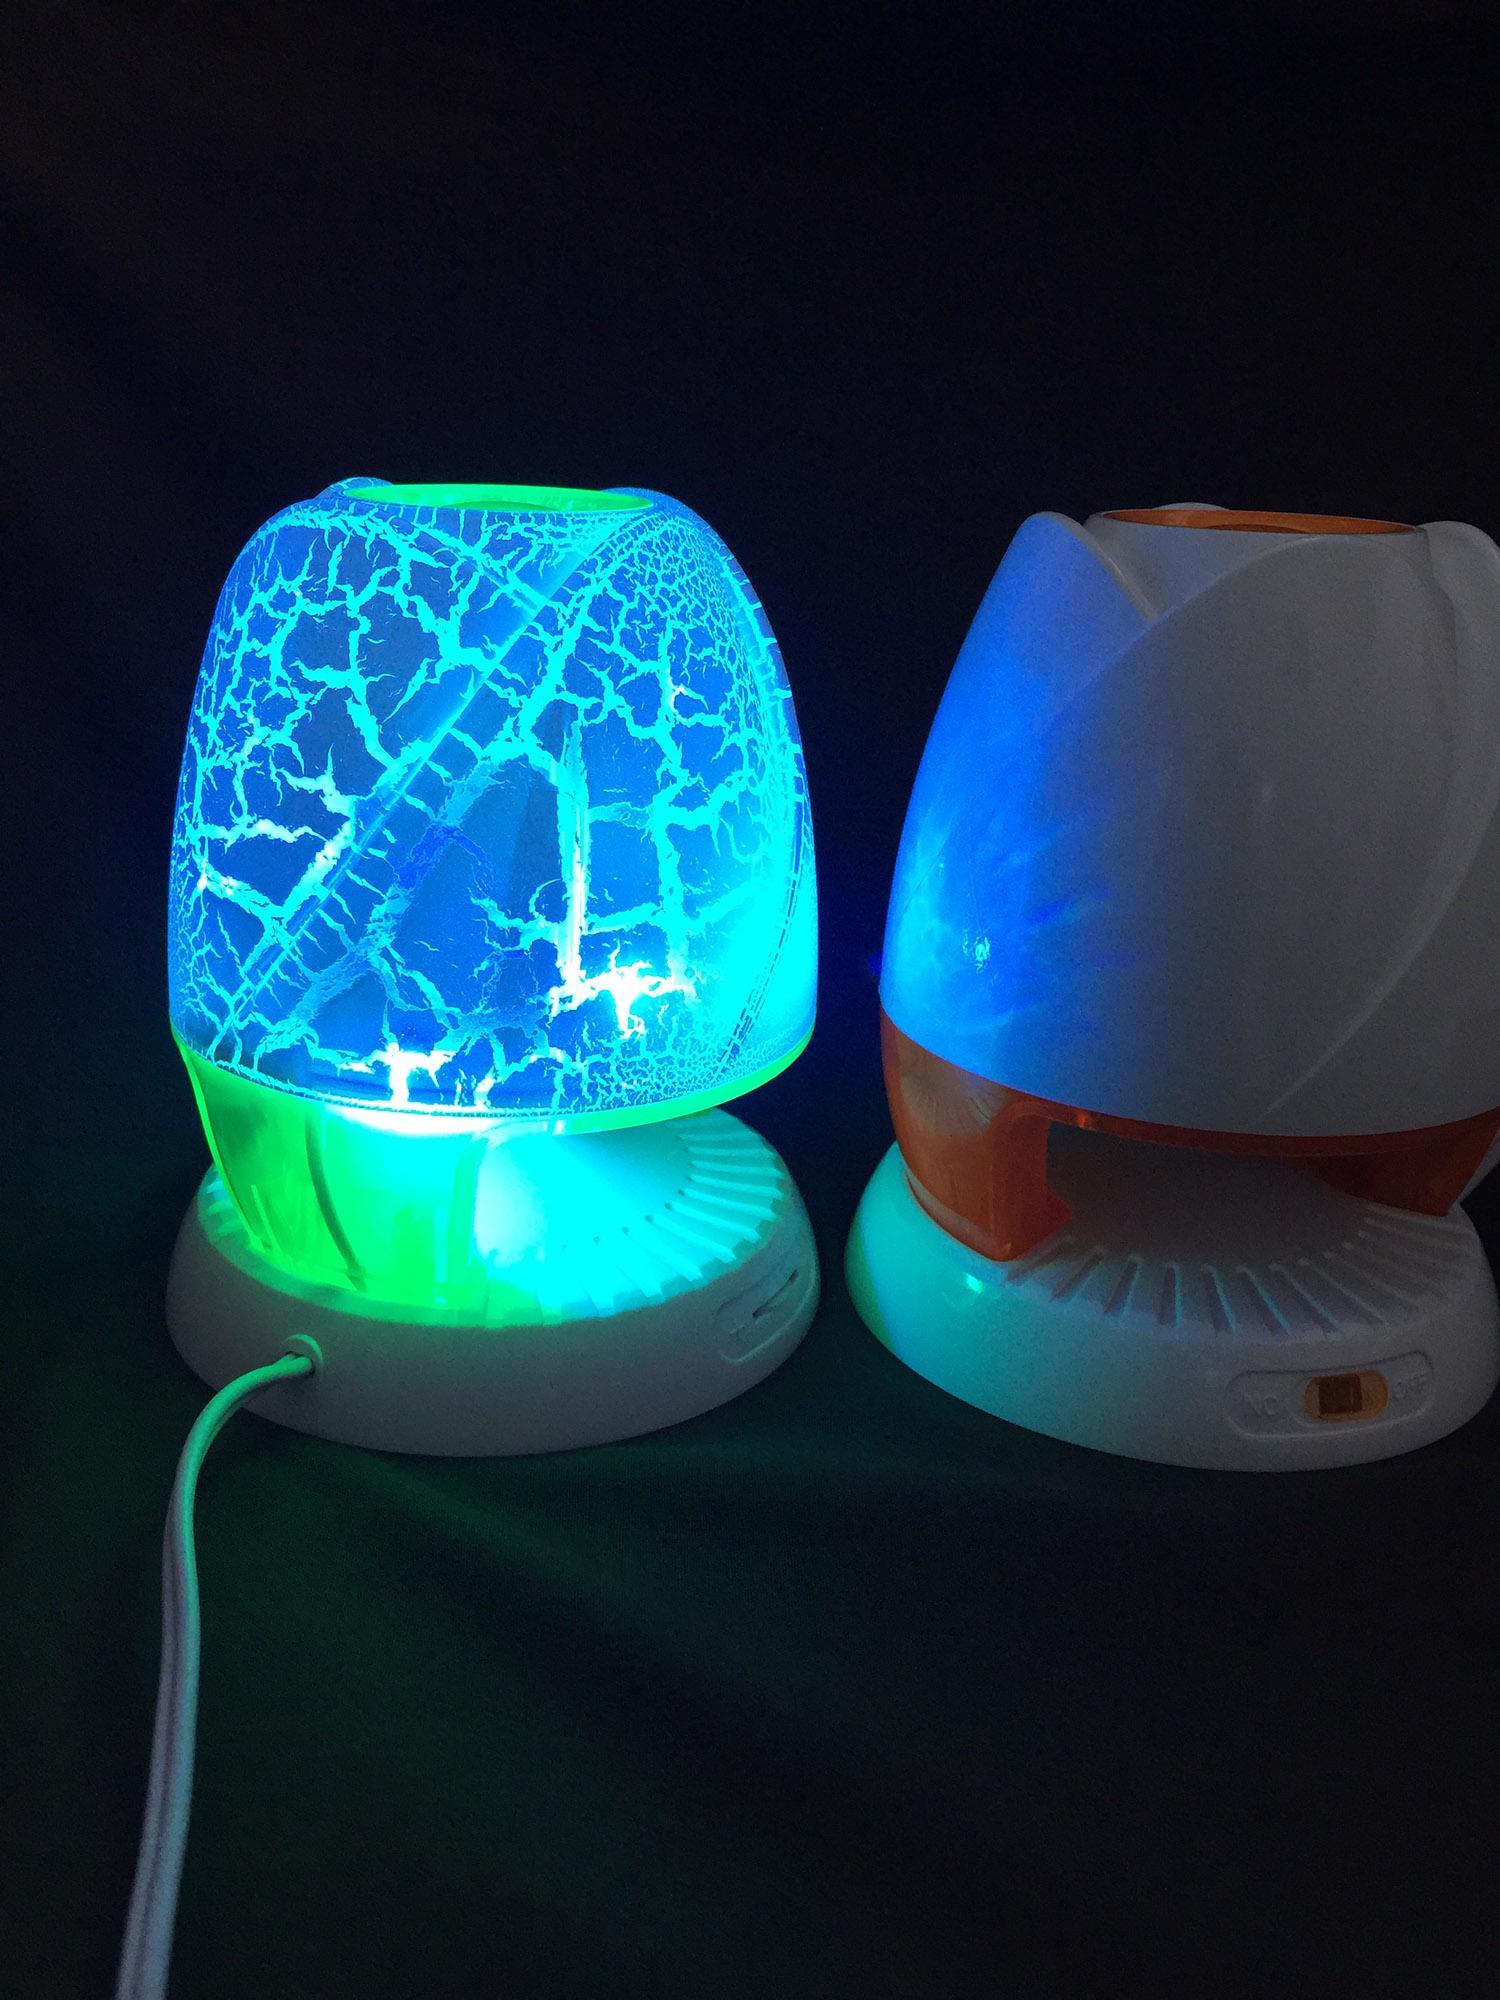 Mini 13cm Speaker Portable Speaker with LOUD SOUND, LED Dancing Light ,High  Bass, 3D sound Subwoofer for PC/ mobile/laptop/xbox/ Pubg